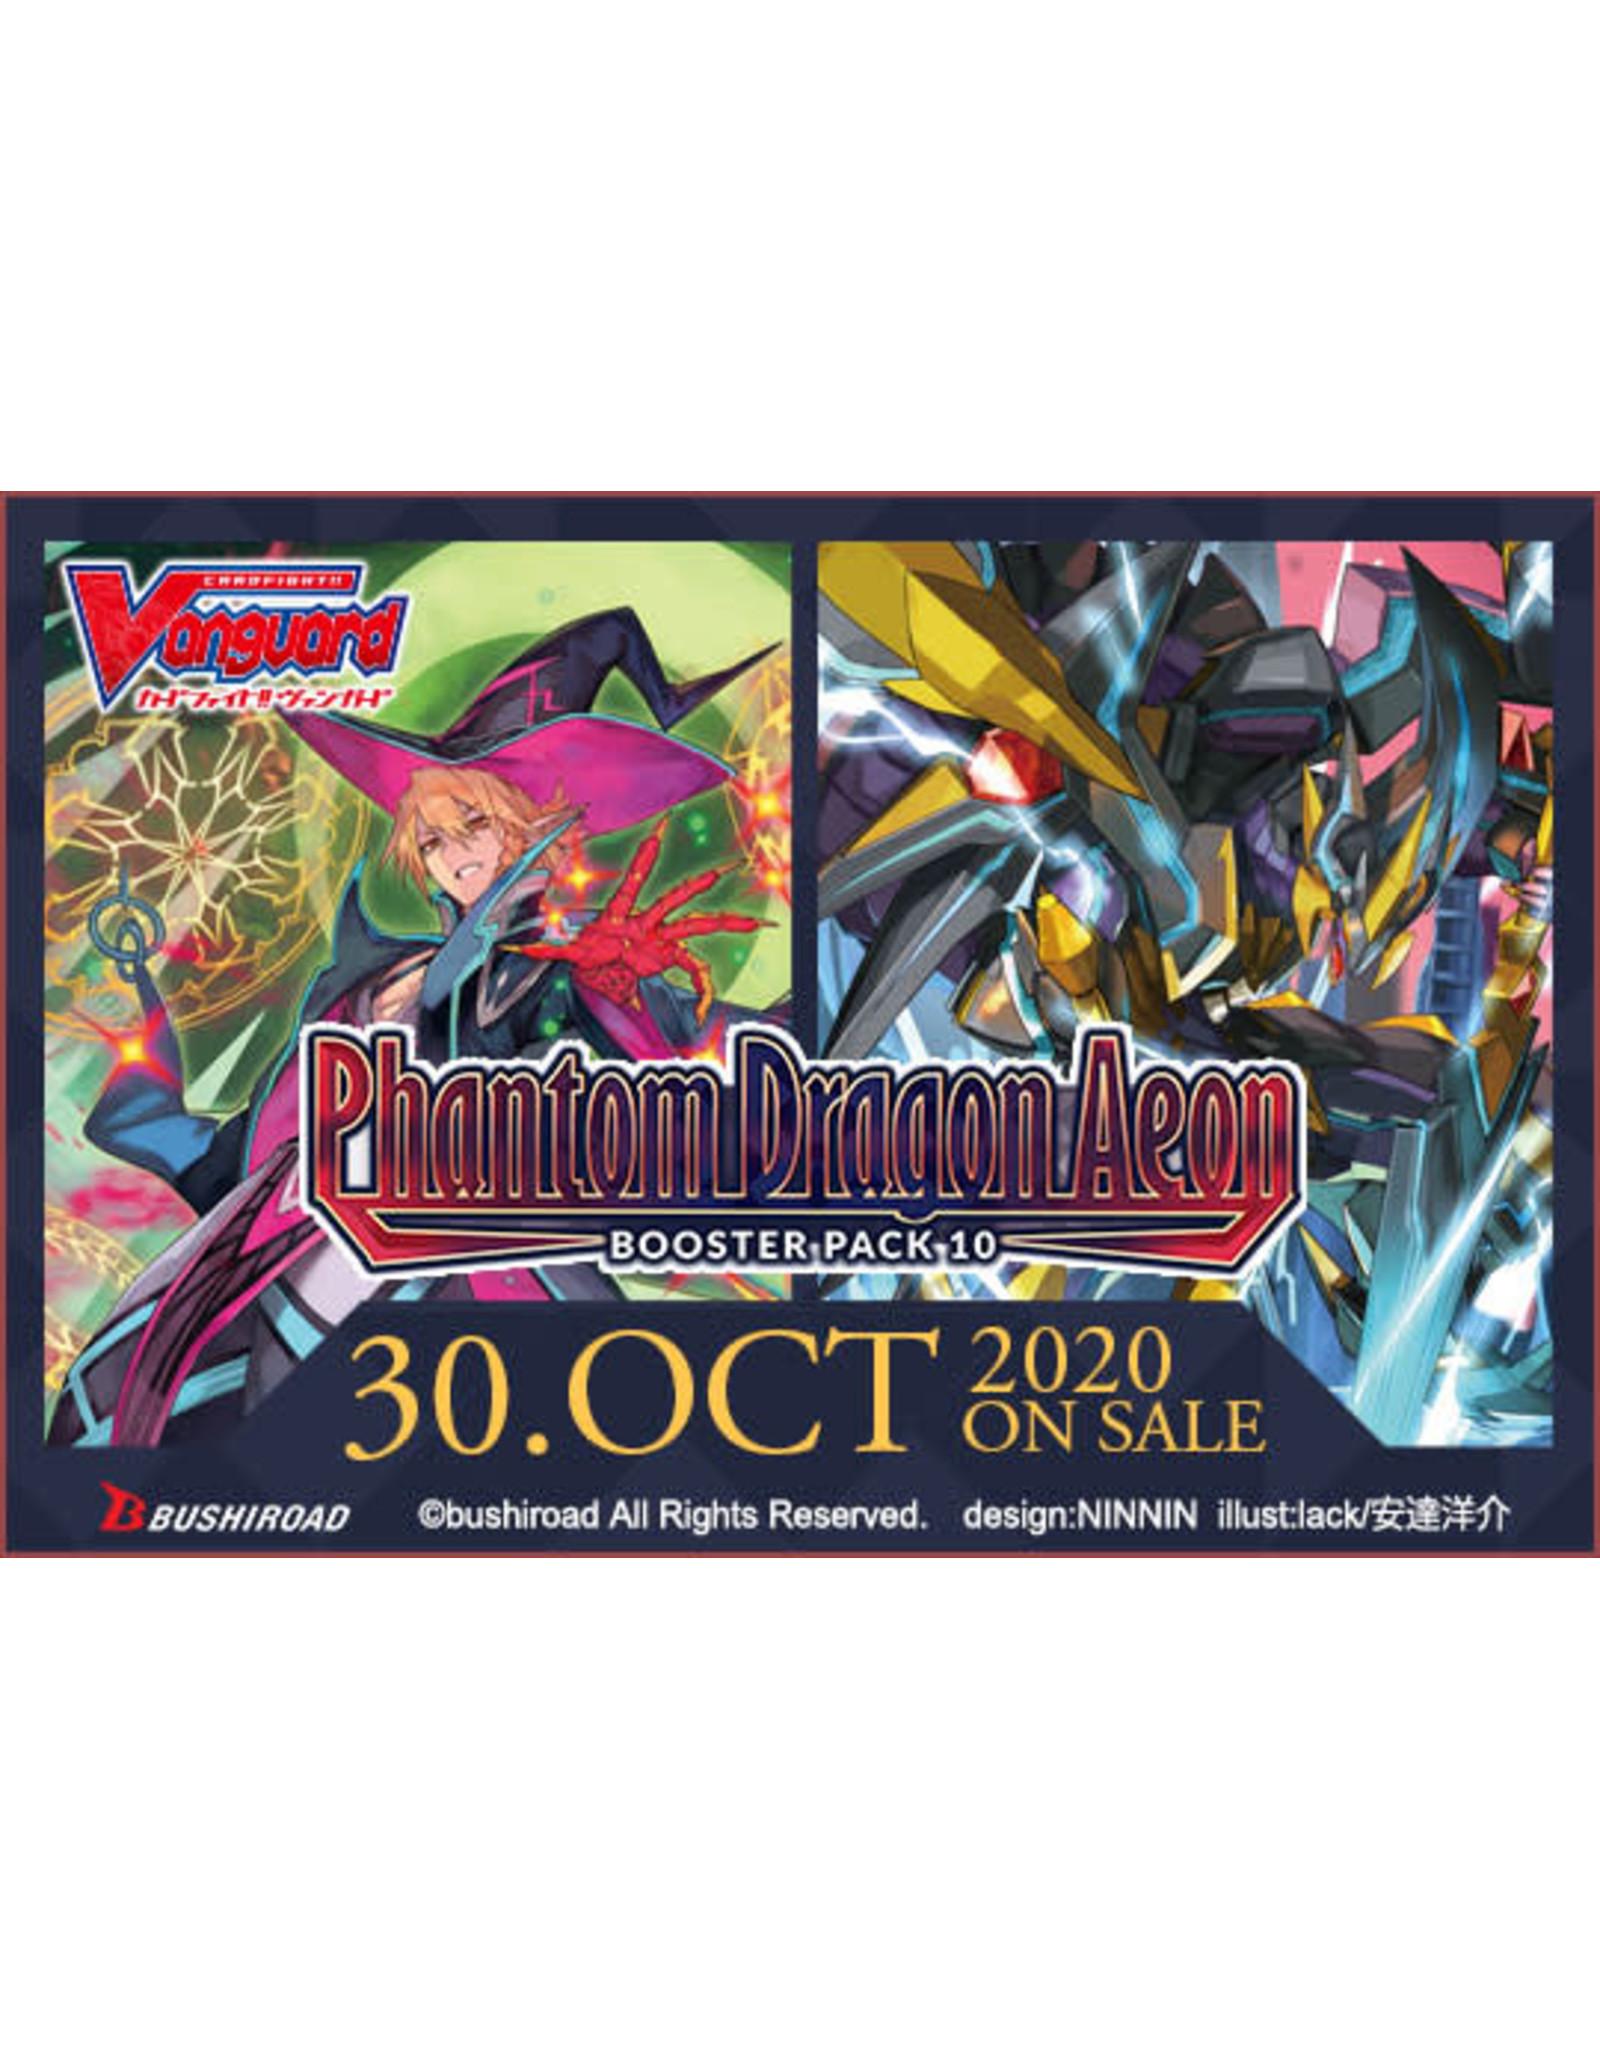 Bushiroad Cardfight!! Vanguard: V Booster 10 - Phantom Dragon Aeon box